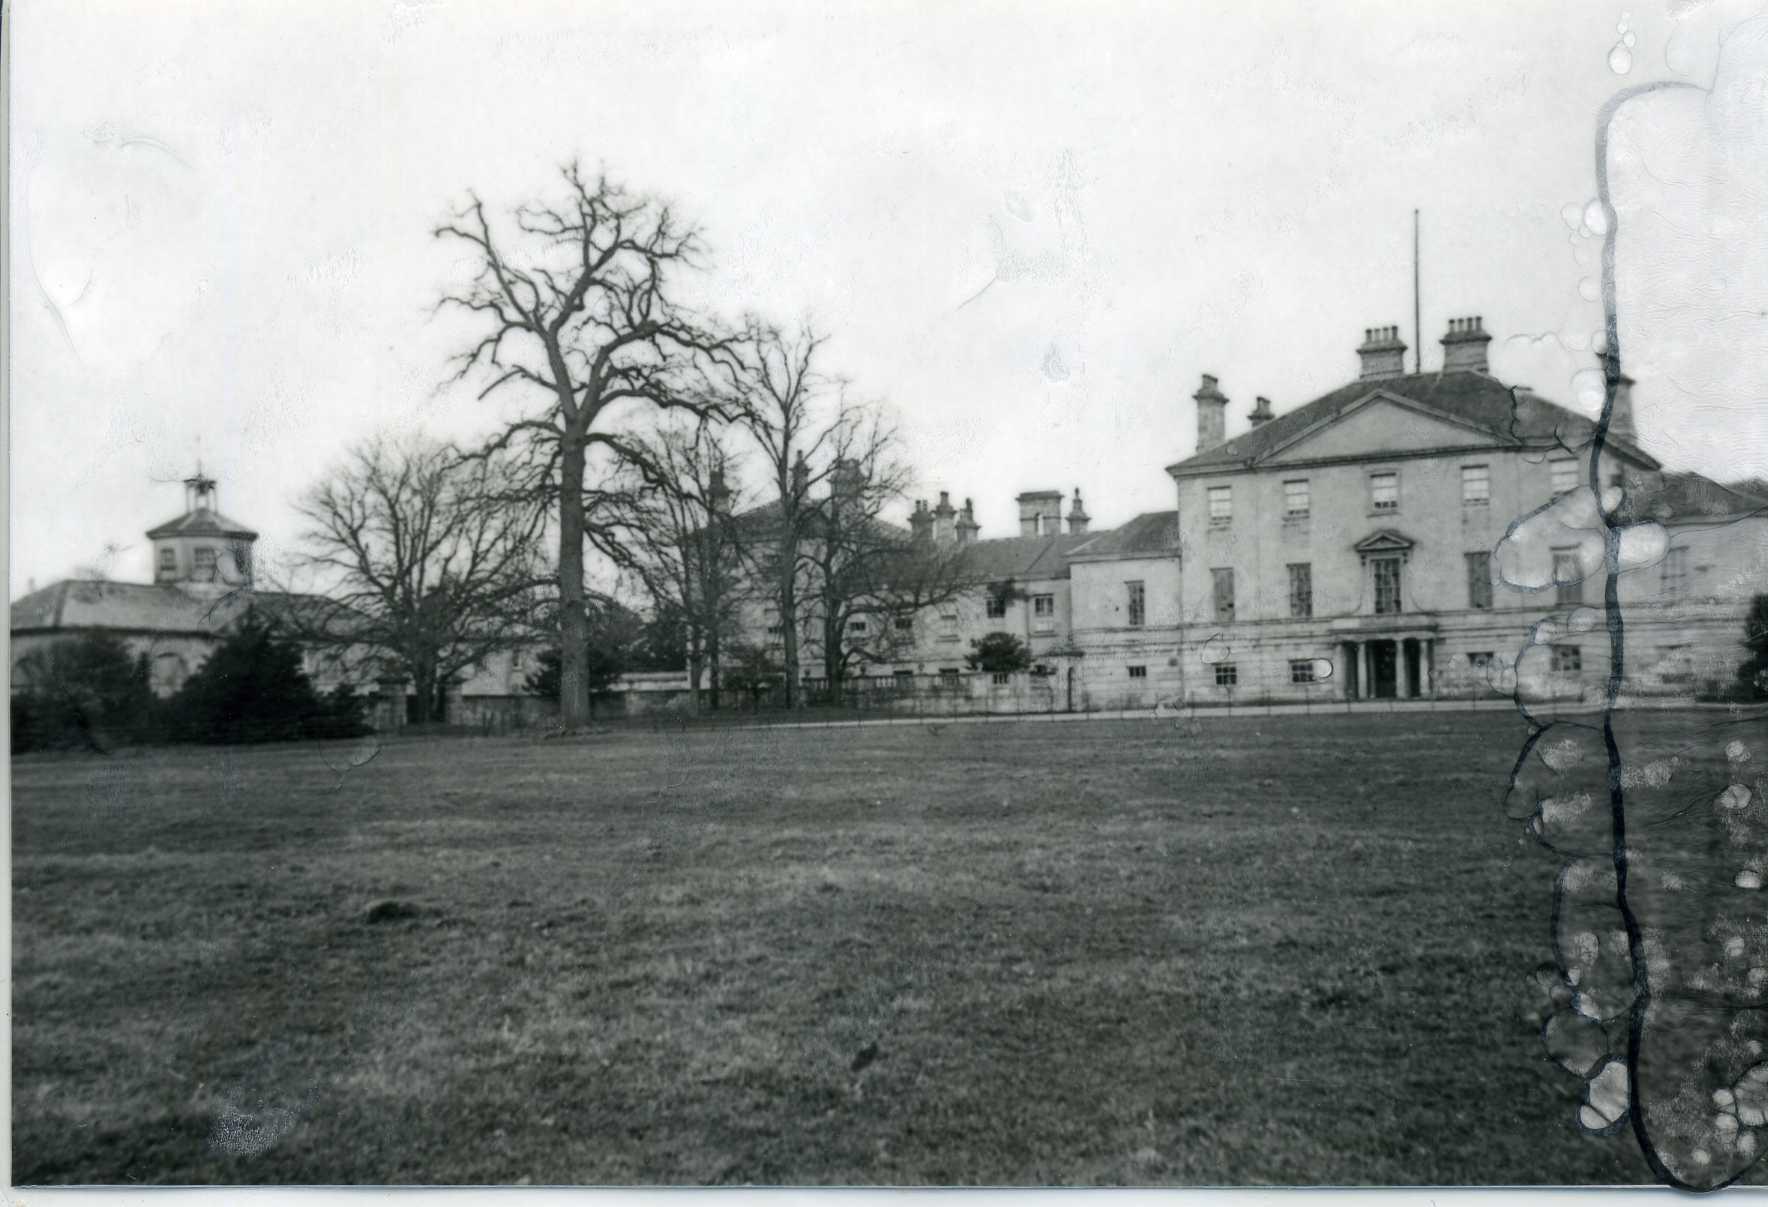 Brocklesby House